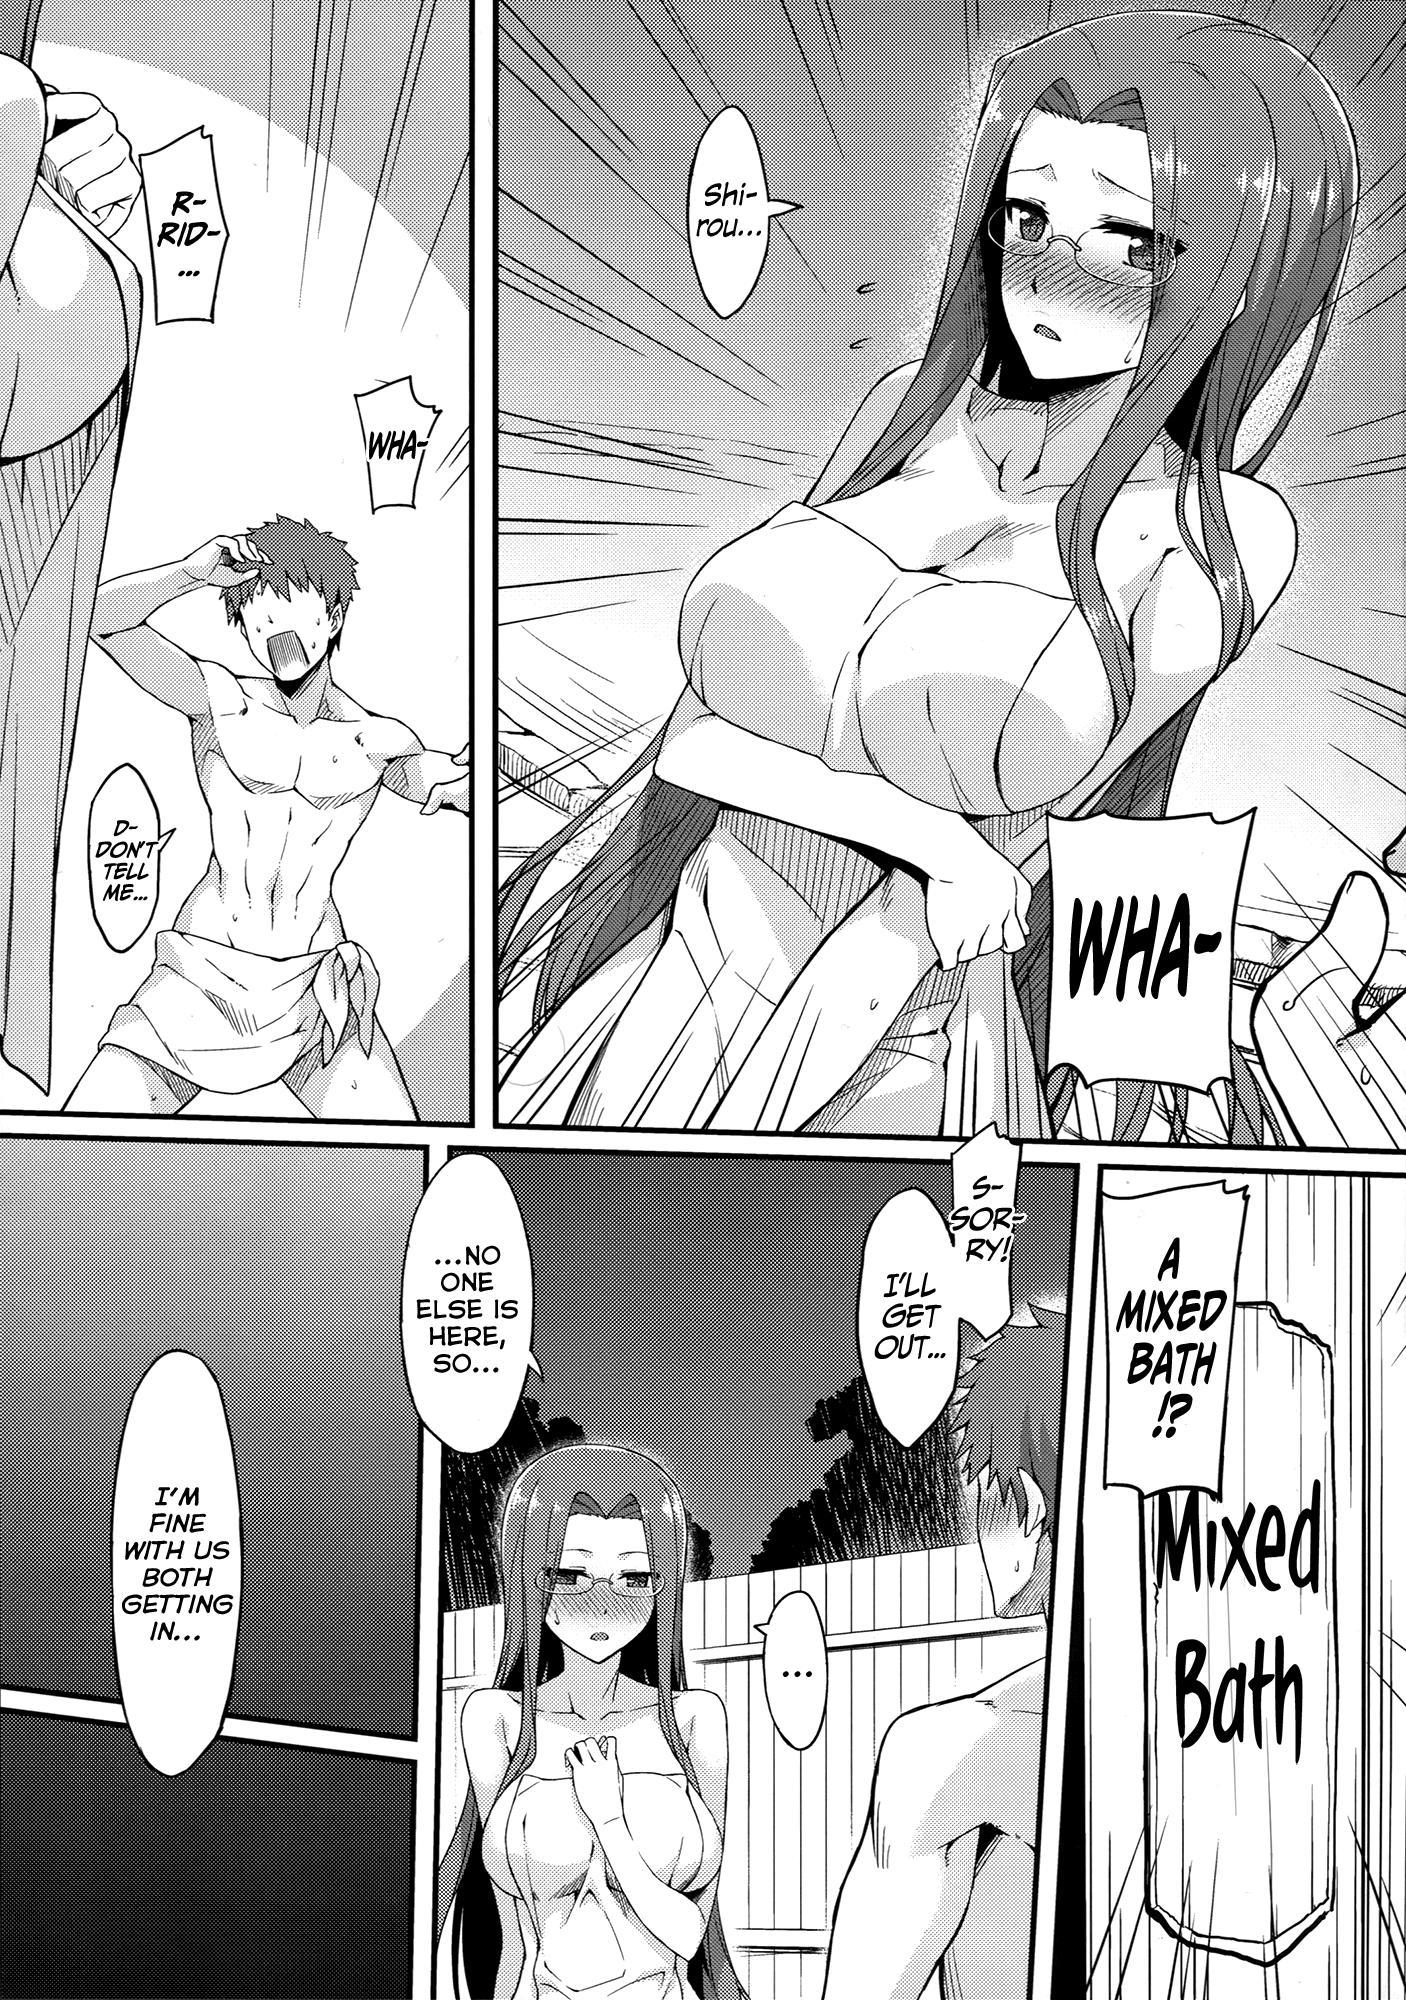 (C87) [S.S.L (Yanagi)] Rider-san to Onsen Yado. | Hot Spring Inn With Rider-san. (Fate/stay night) [English] [Facedesk] 5